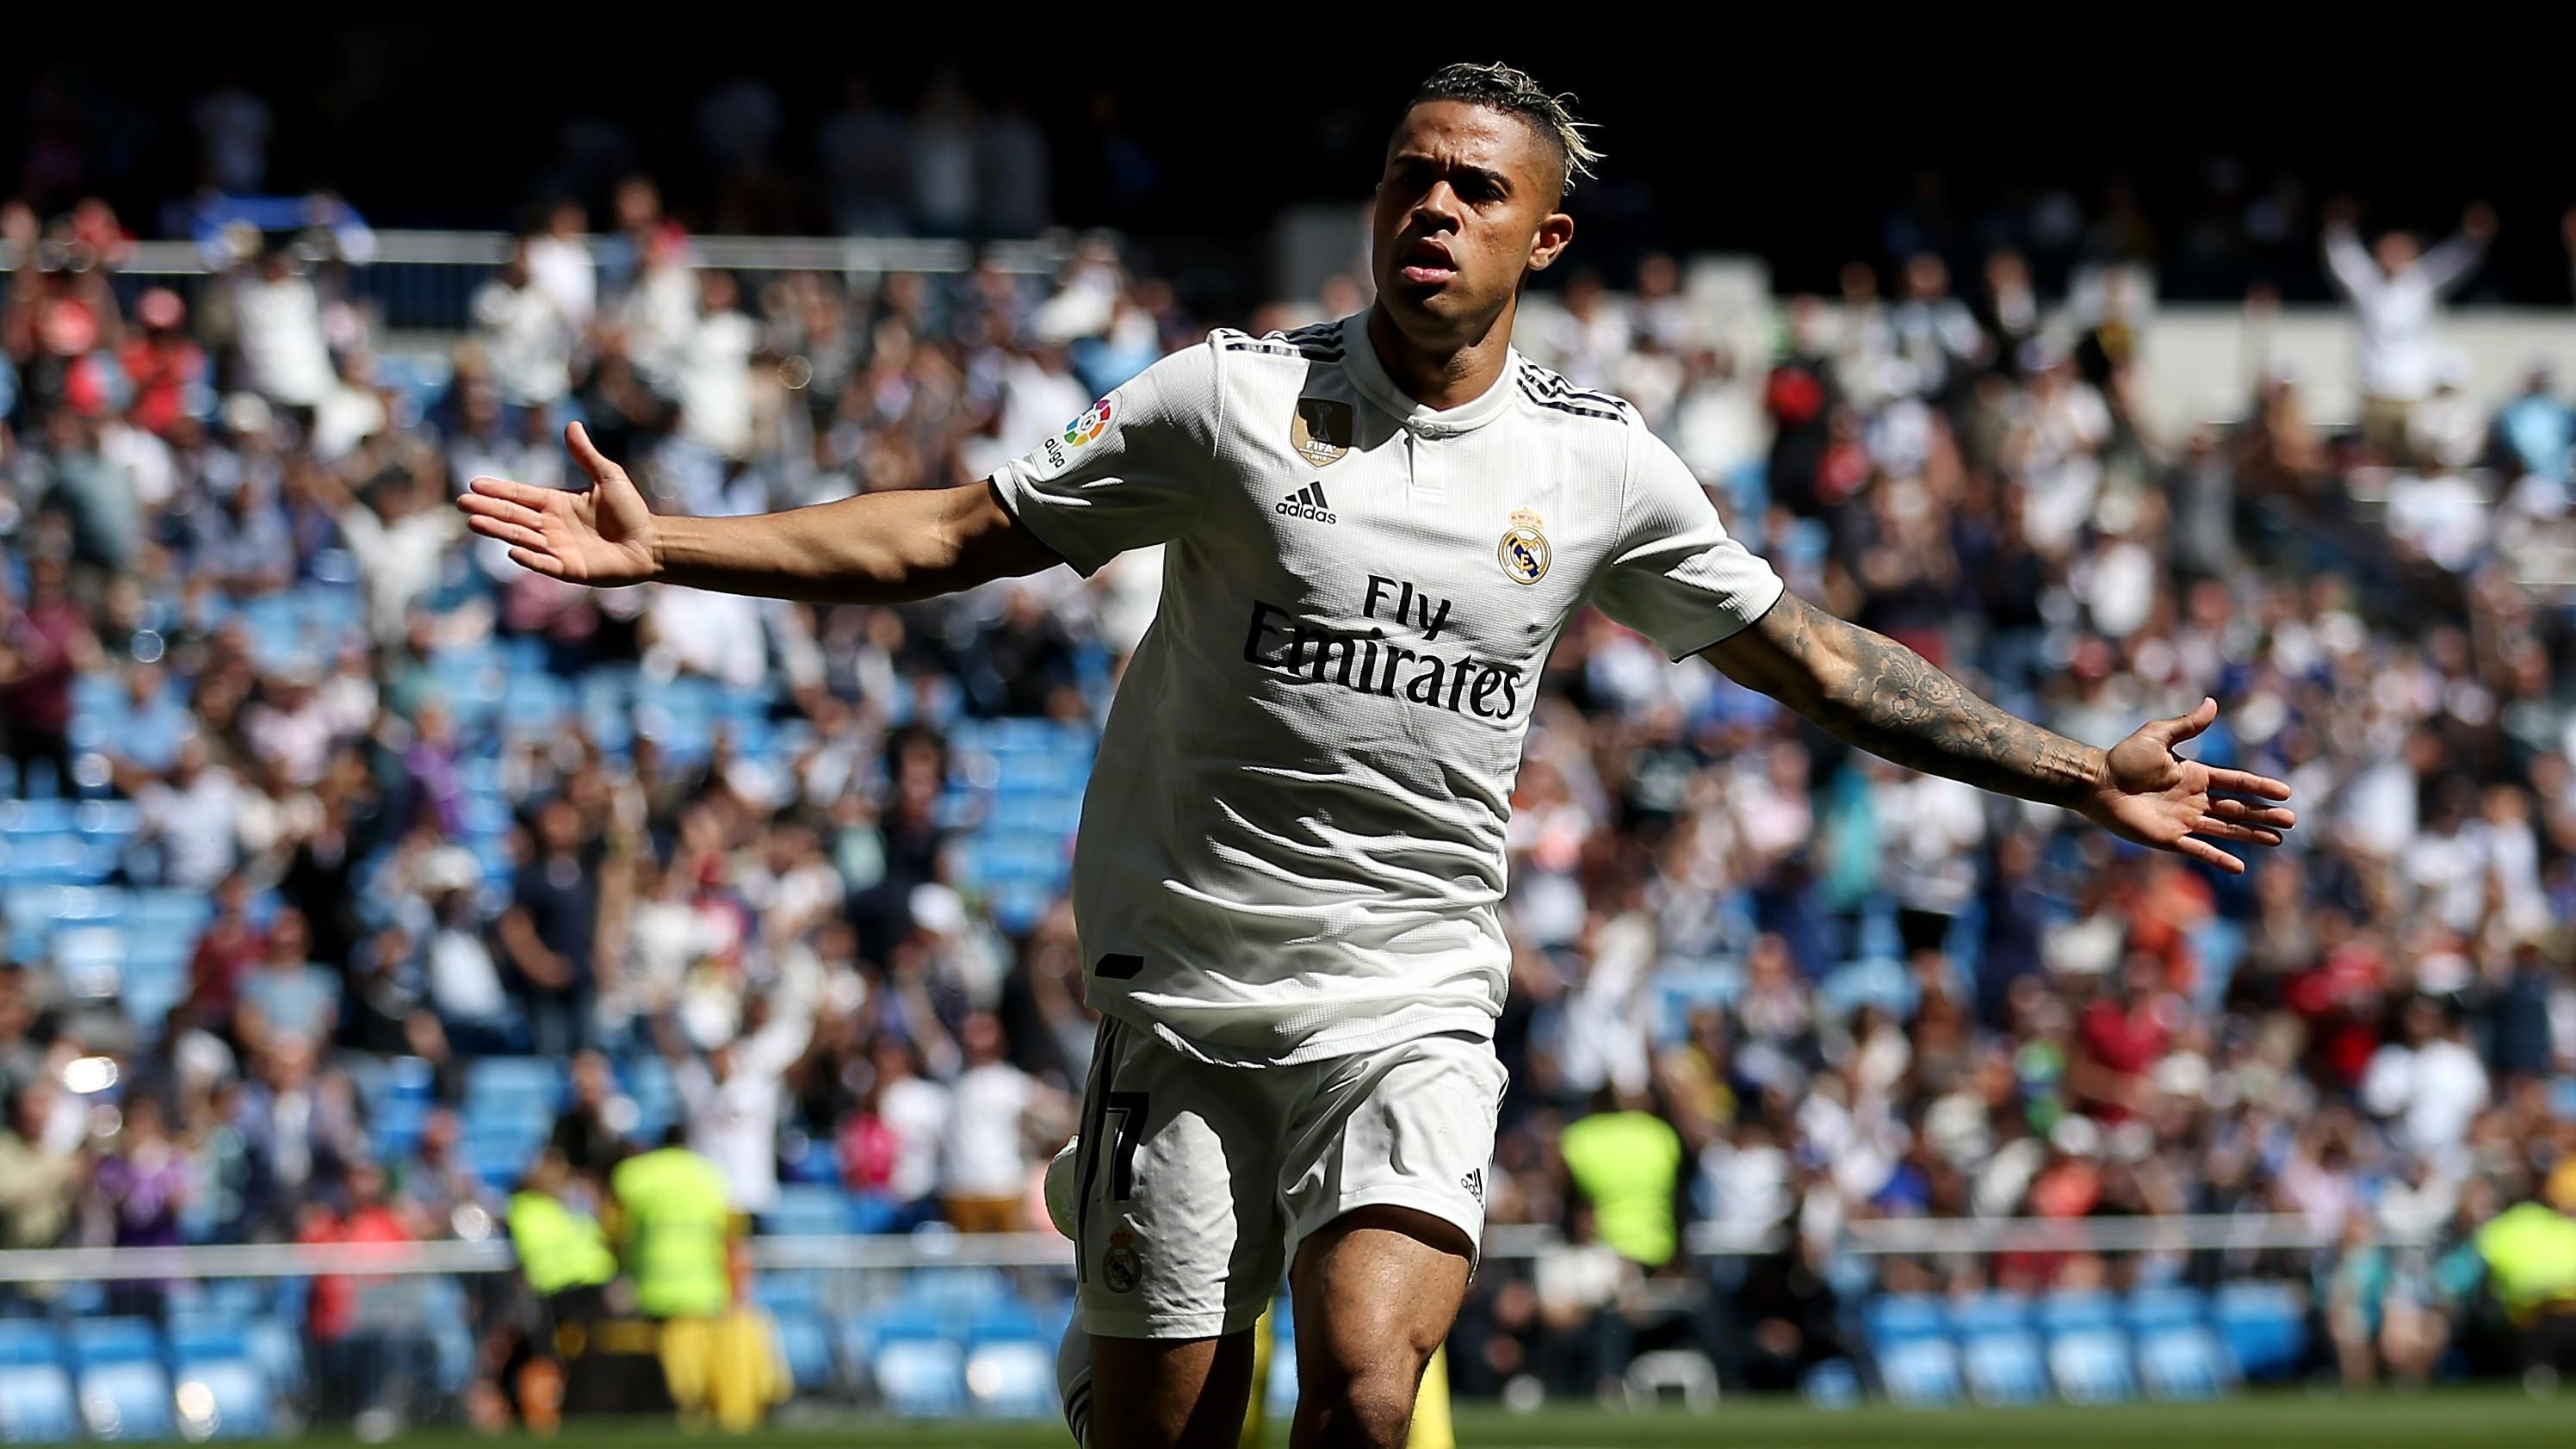 Mercato - Real Madrid : Mariano Diaz pisté par l'AS Rome ?